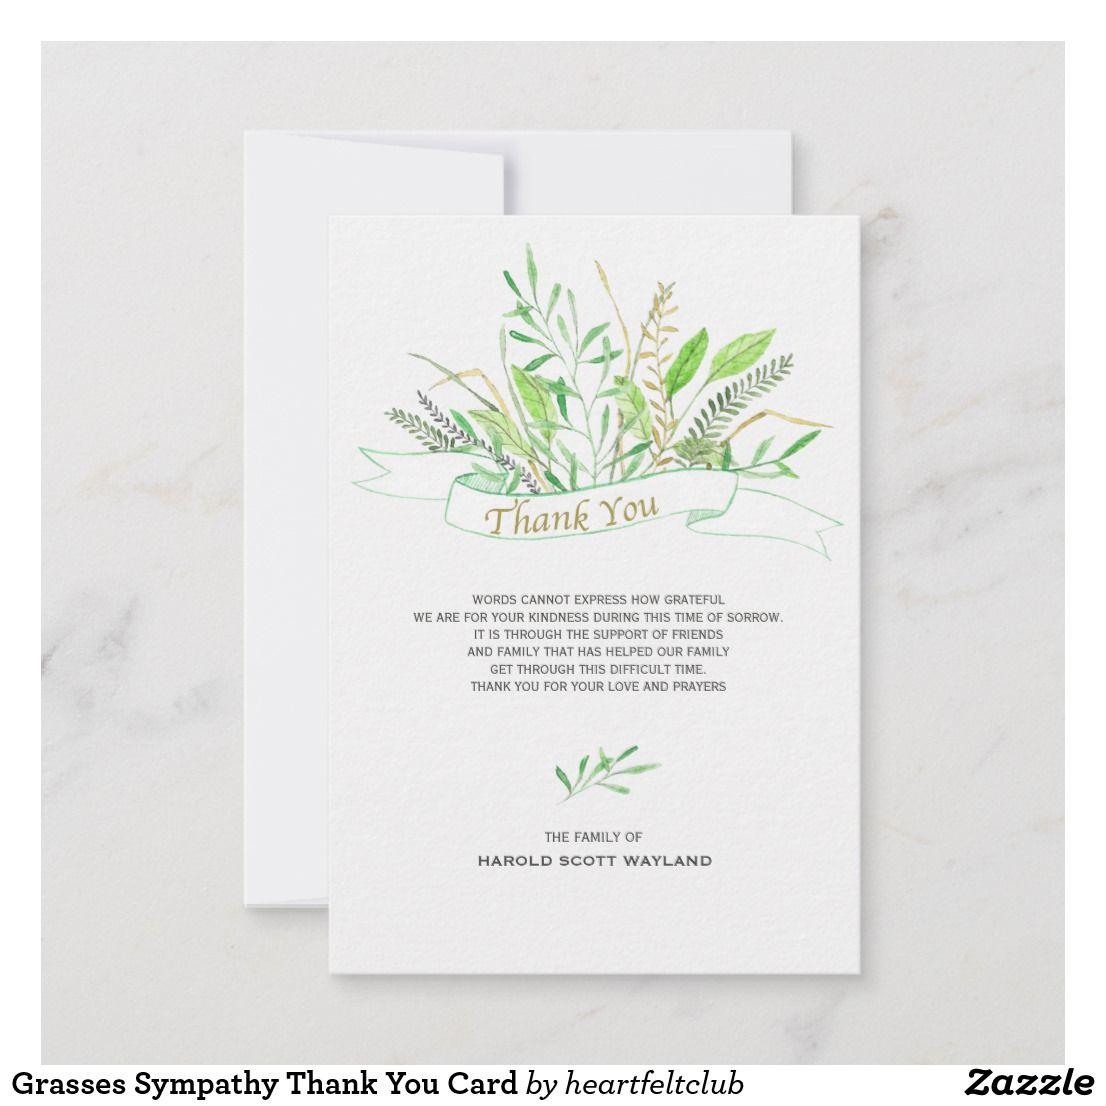 Grasses sympathy thank you card